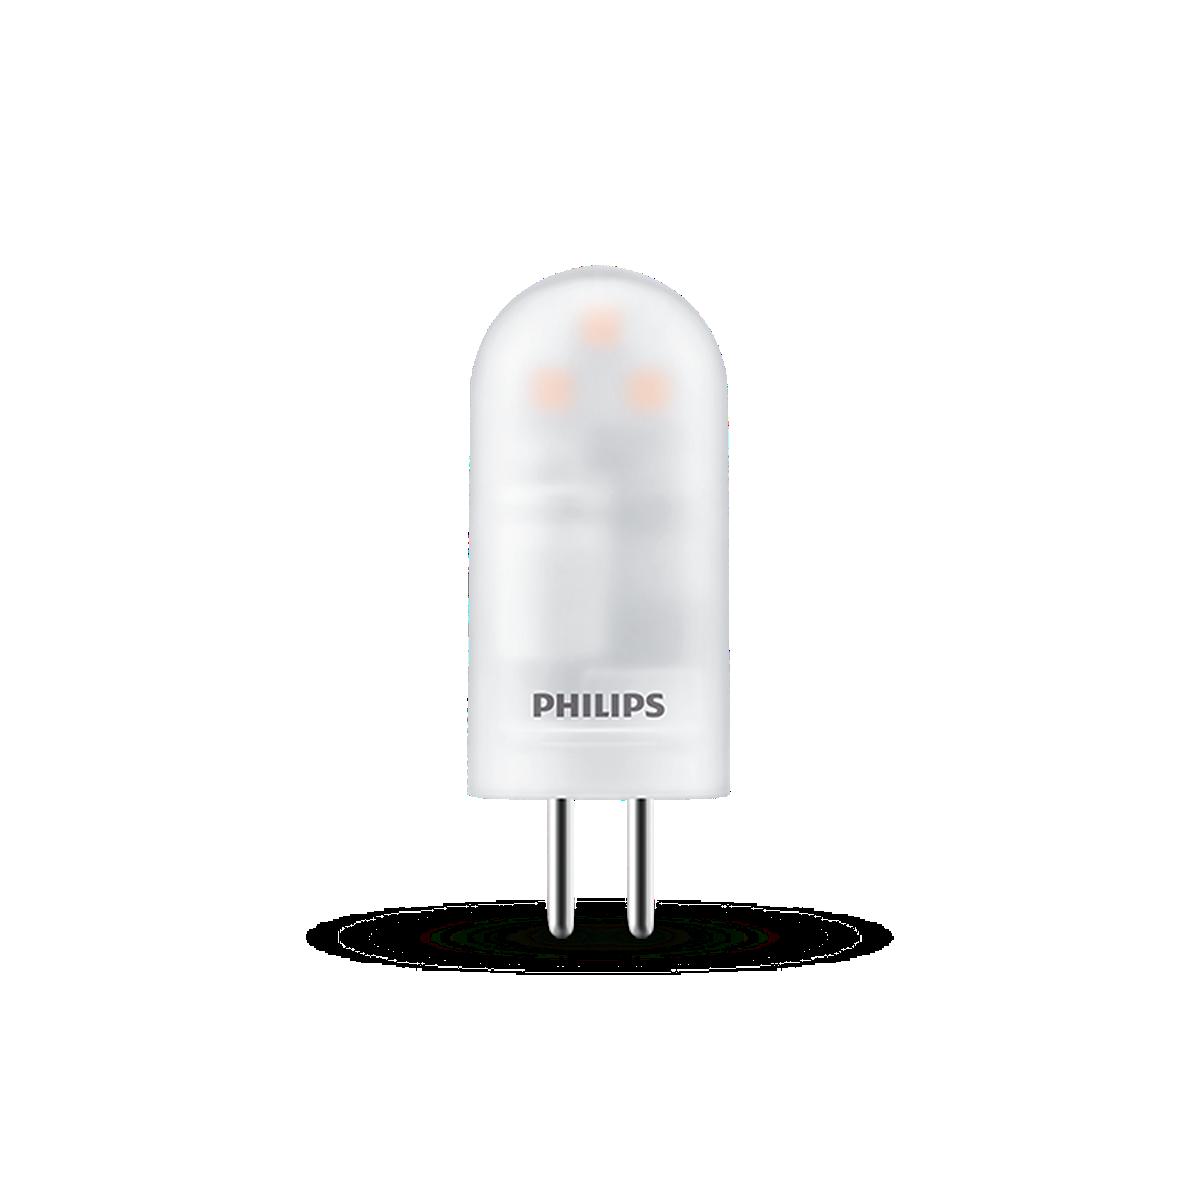 corepro ledcapsule g4 stiftsockellampen led lampen. Black Bedroom Furniture Sets. Home Design Ideas